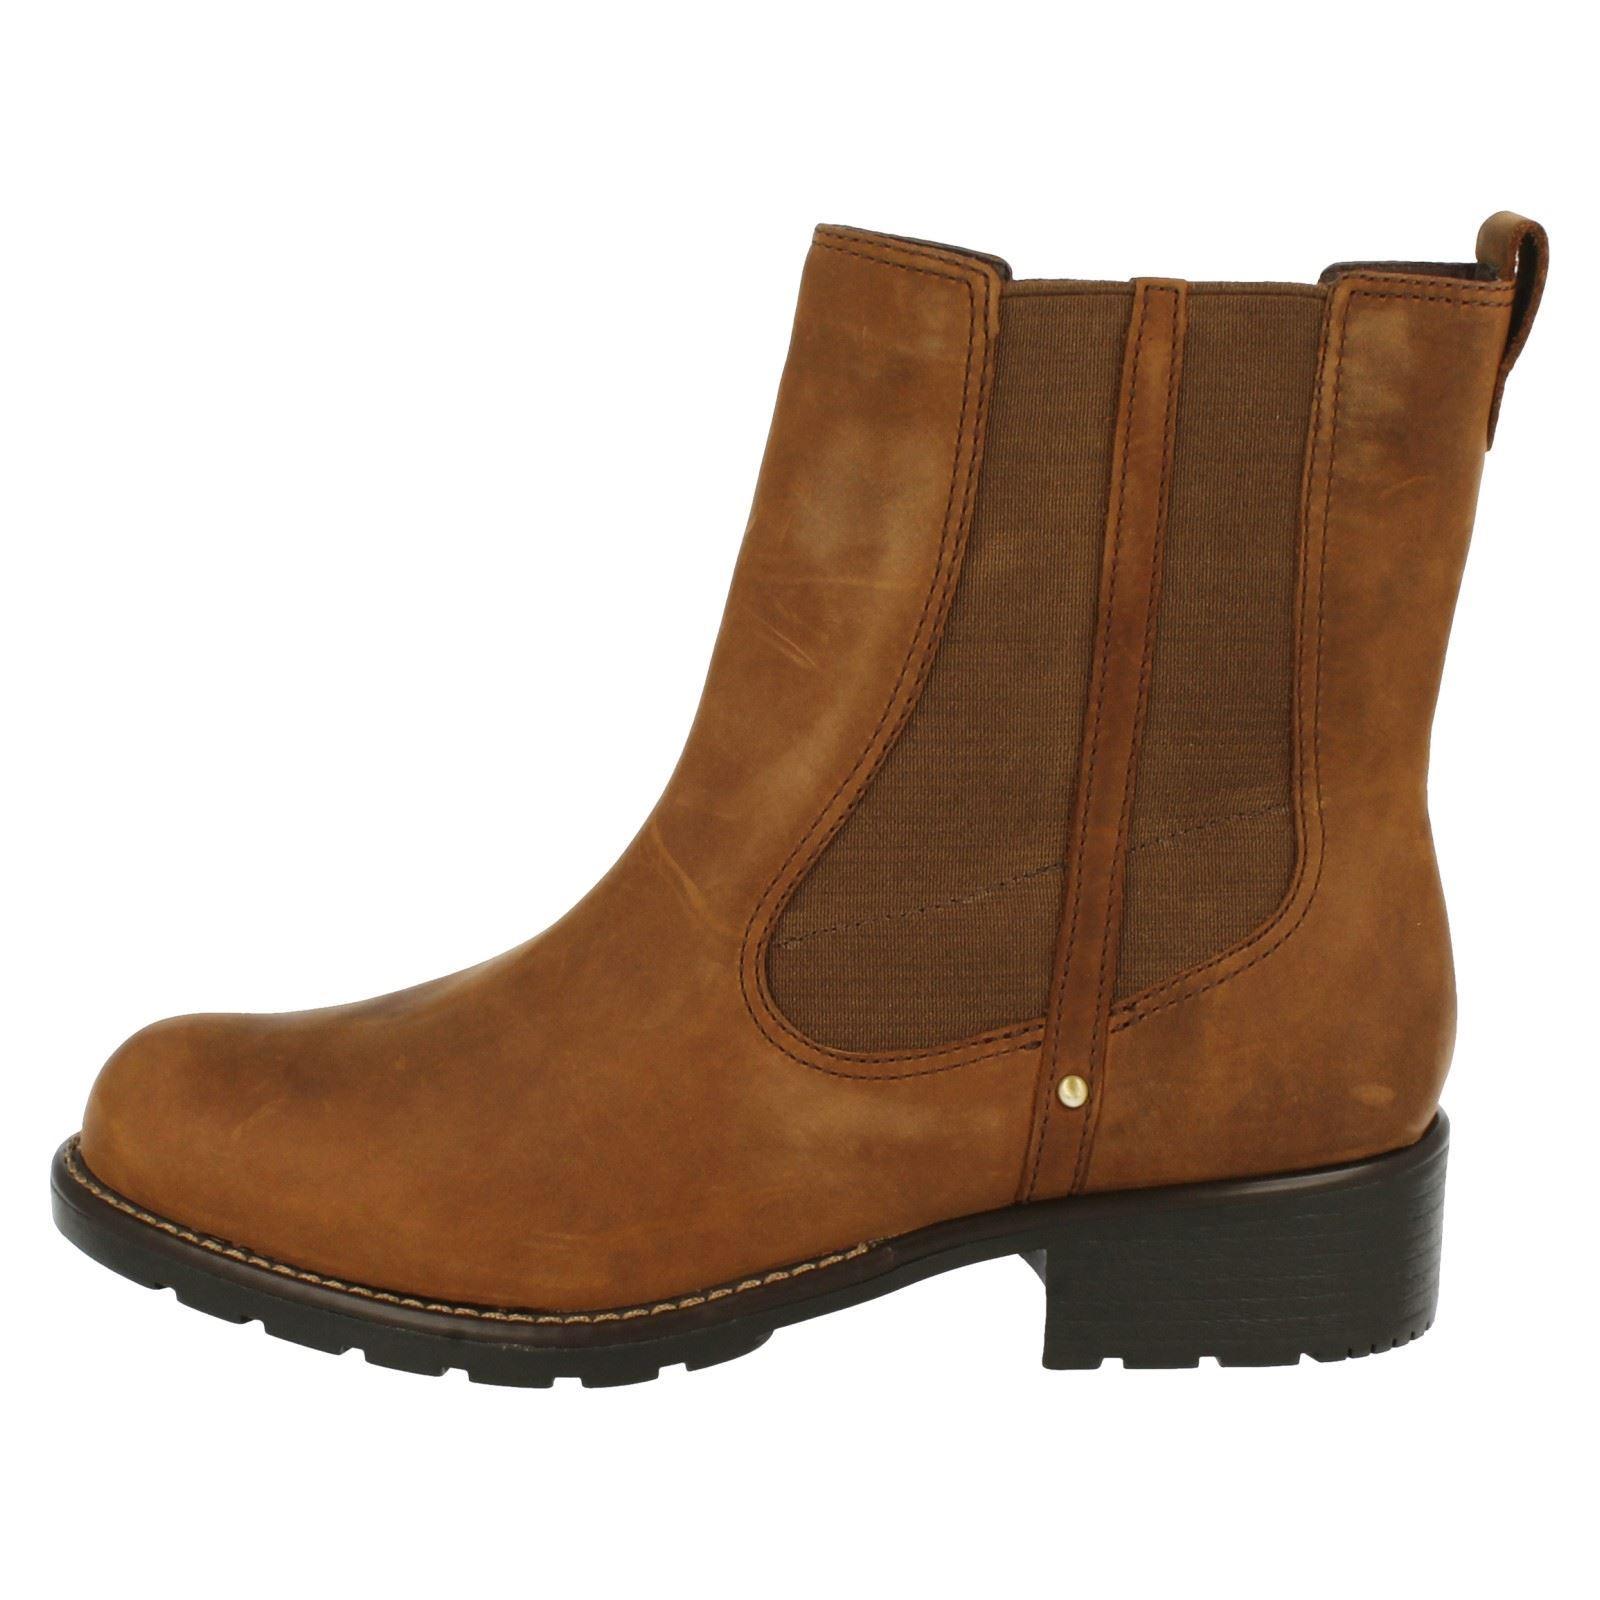 Ladies Clarks Orinoco Club Chelsea Pull On Boots